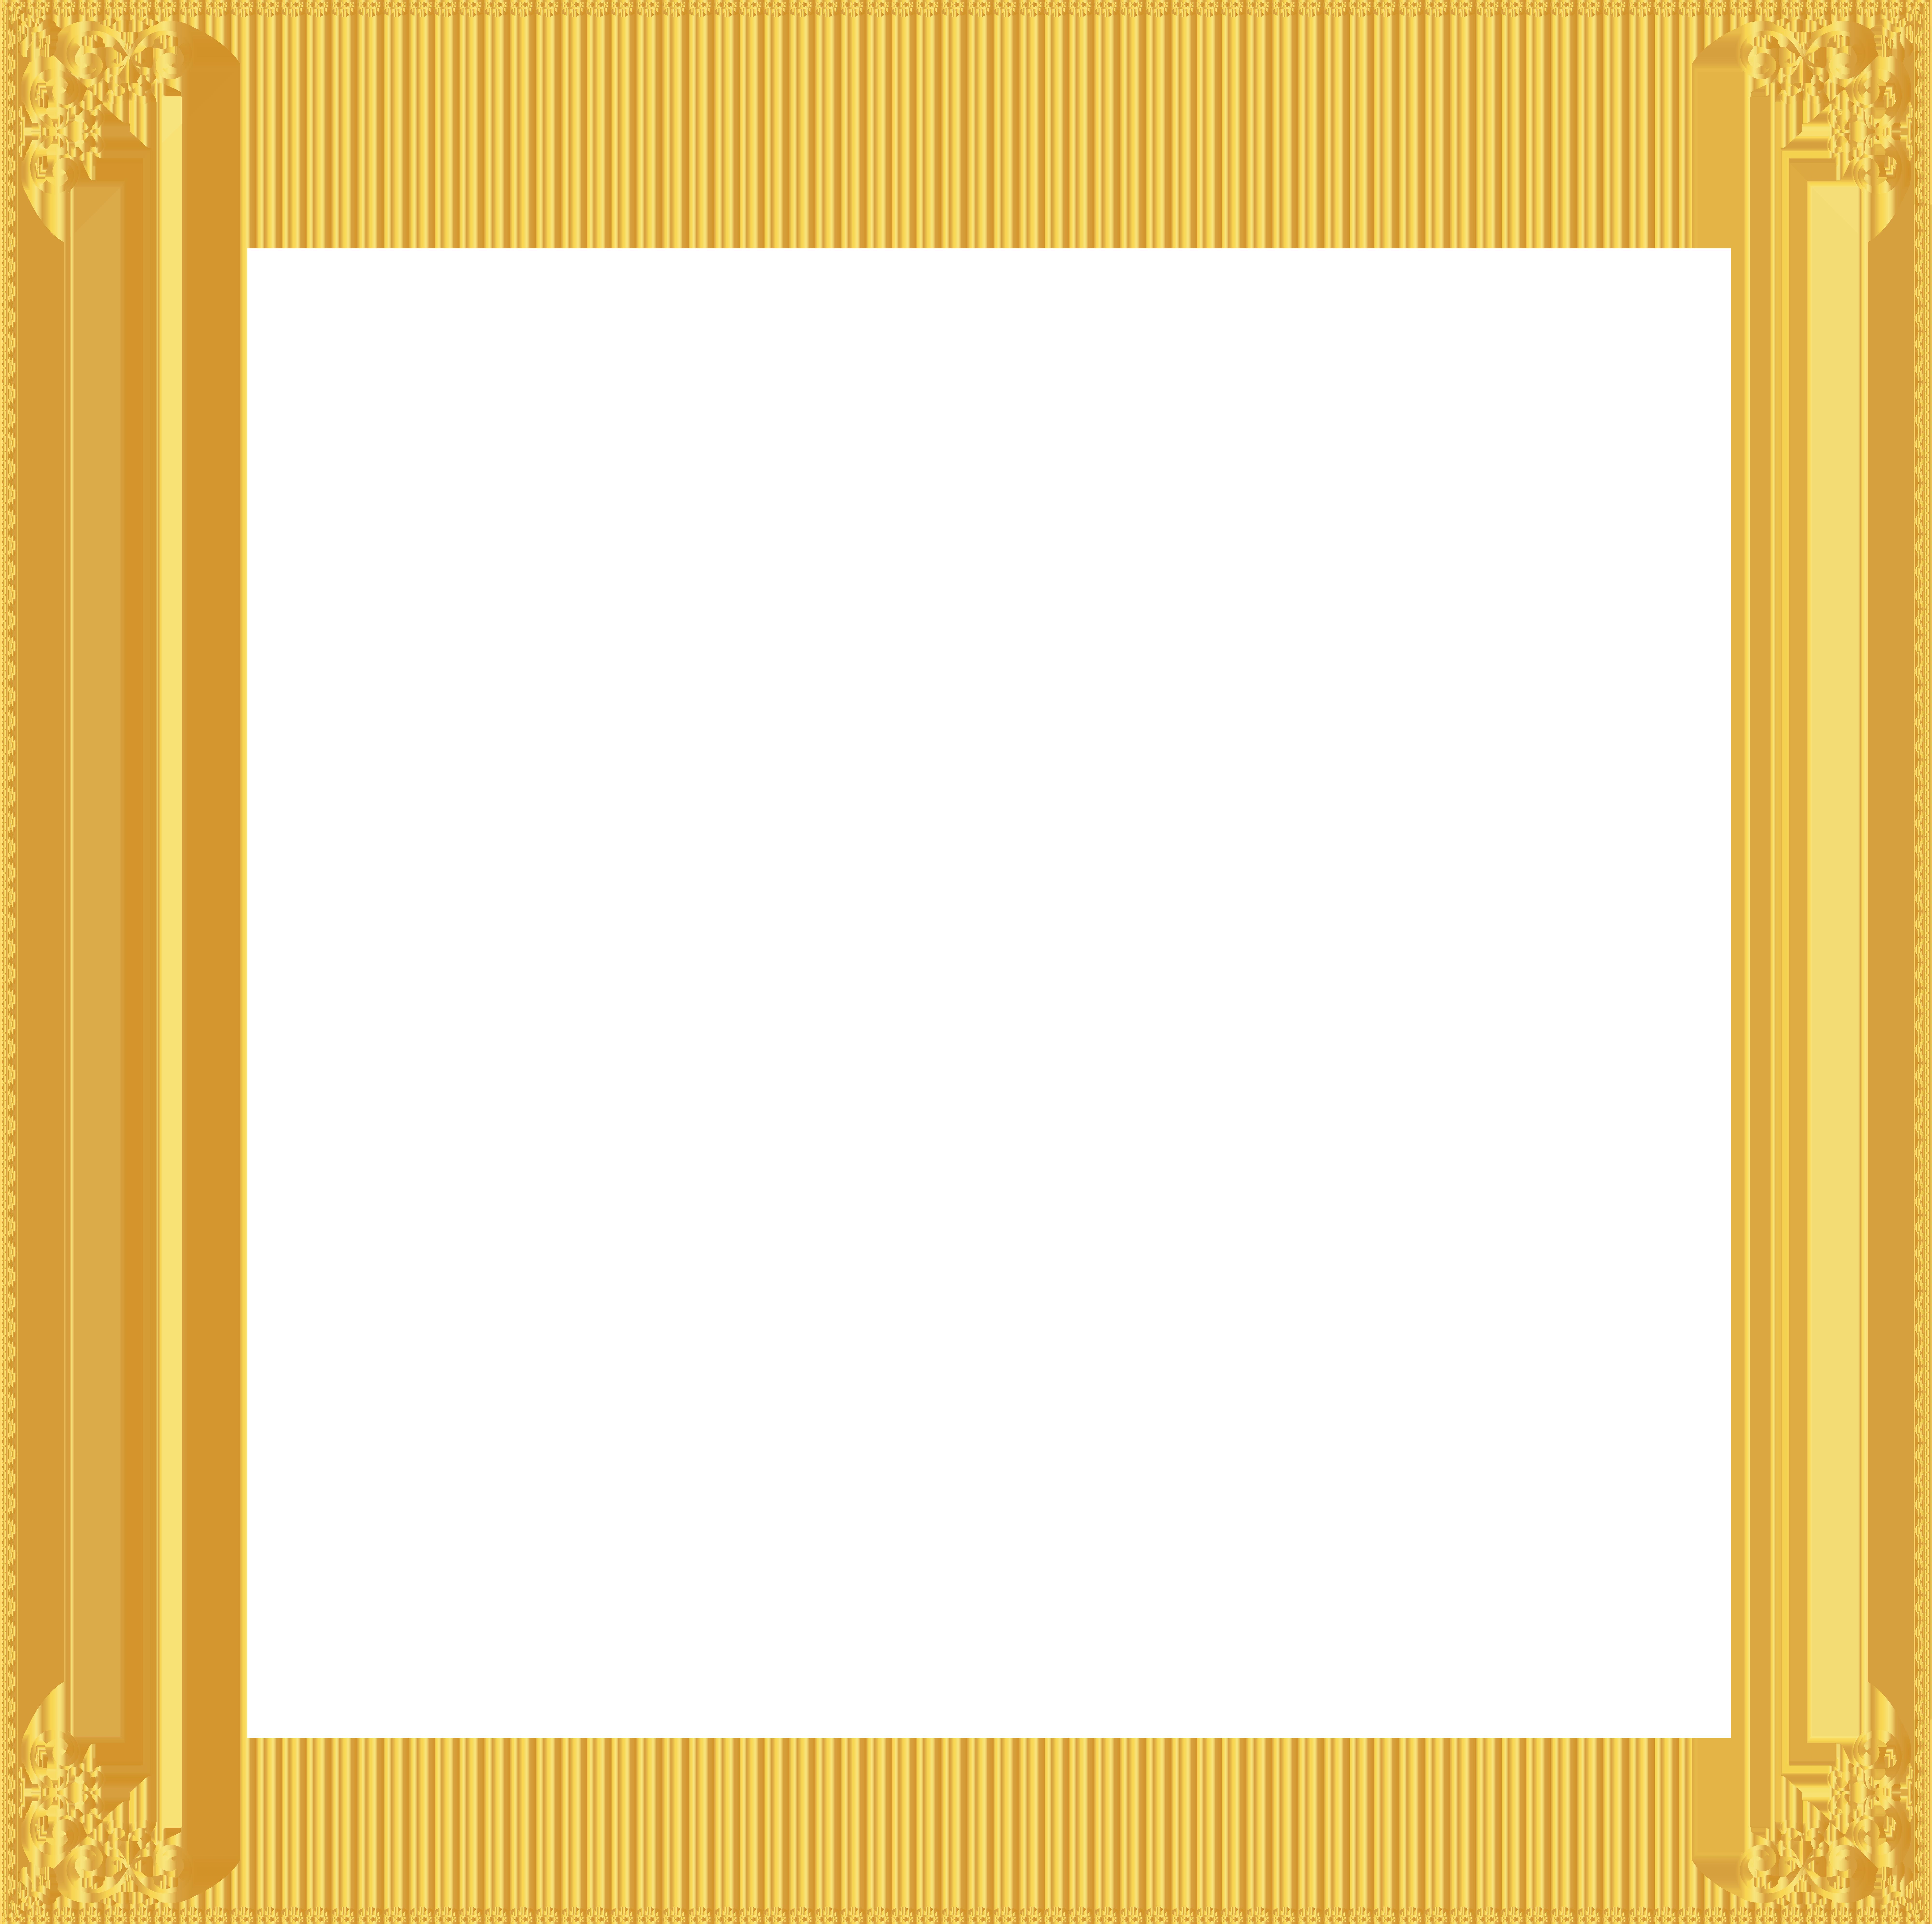 Sunday school border clipart jpg royalty free library Golden Border Frame Transparent Clip Art Image   Gallery ... jpg royalty free library